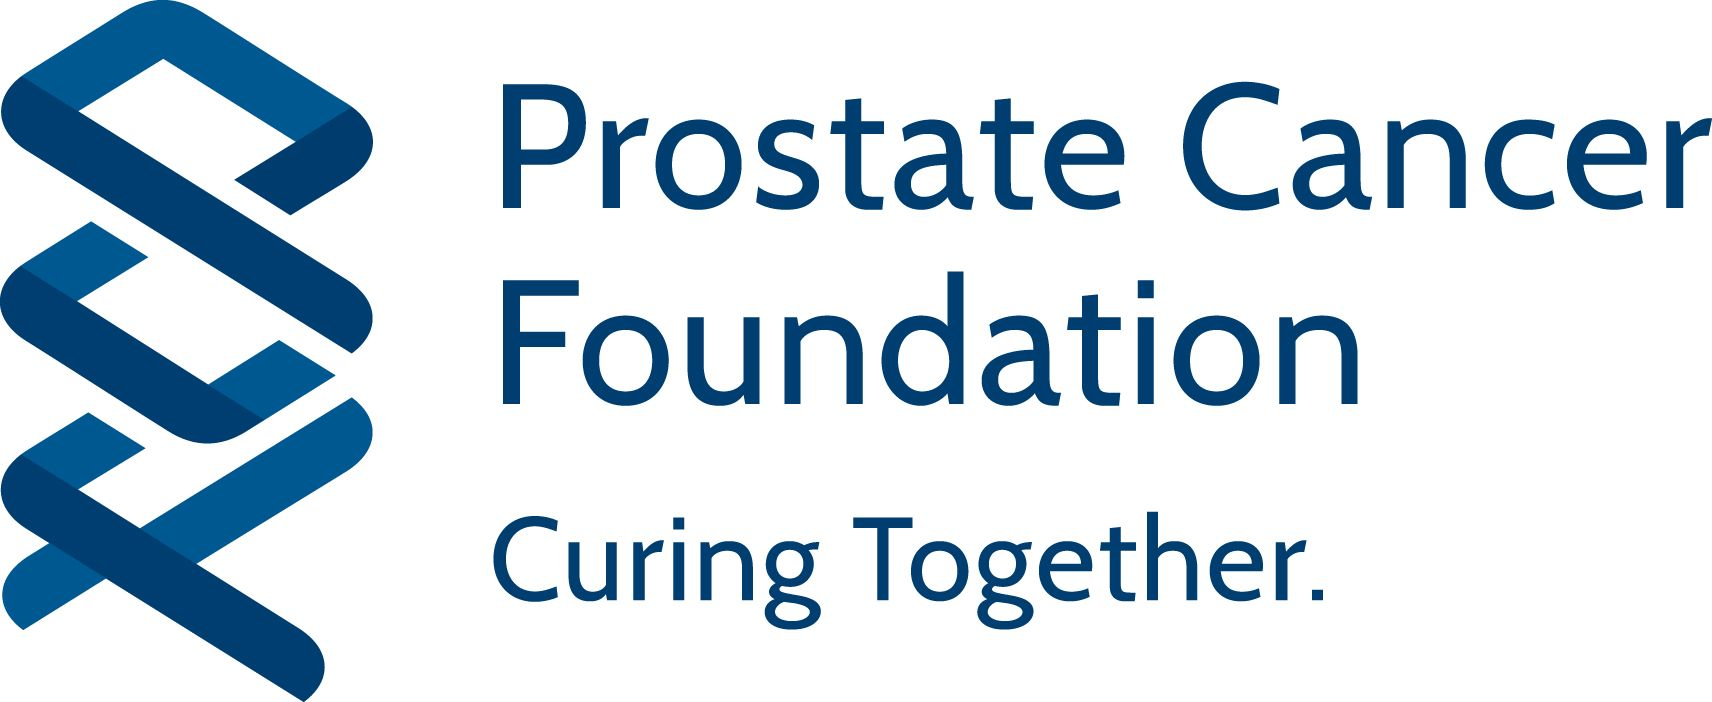 Advocacy Groups | <b>Prostate Cancer Foundation</b>